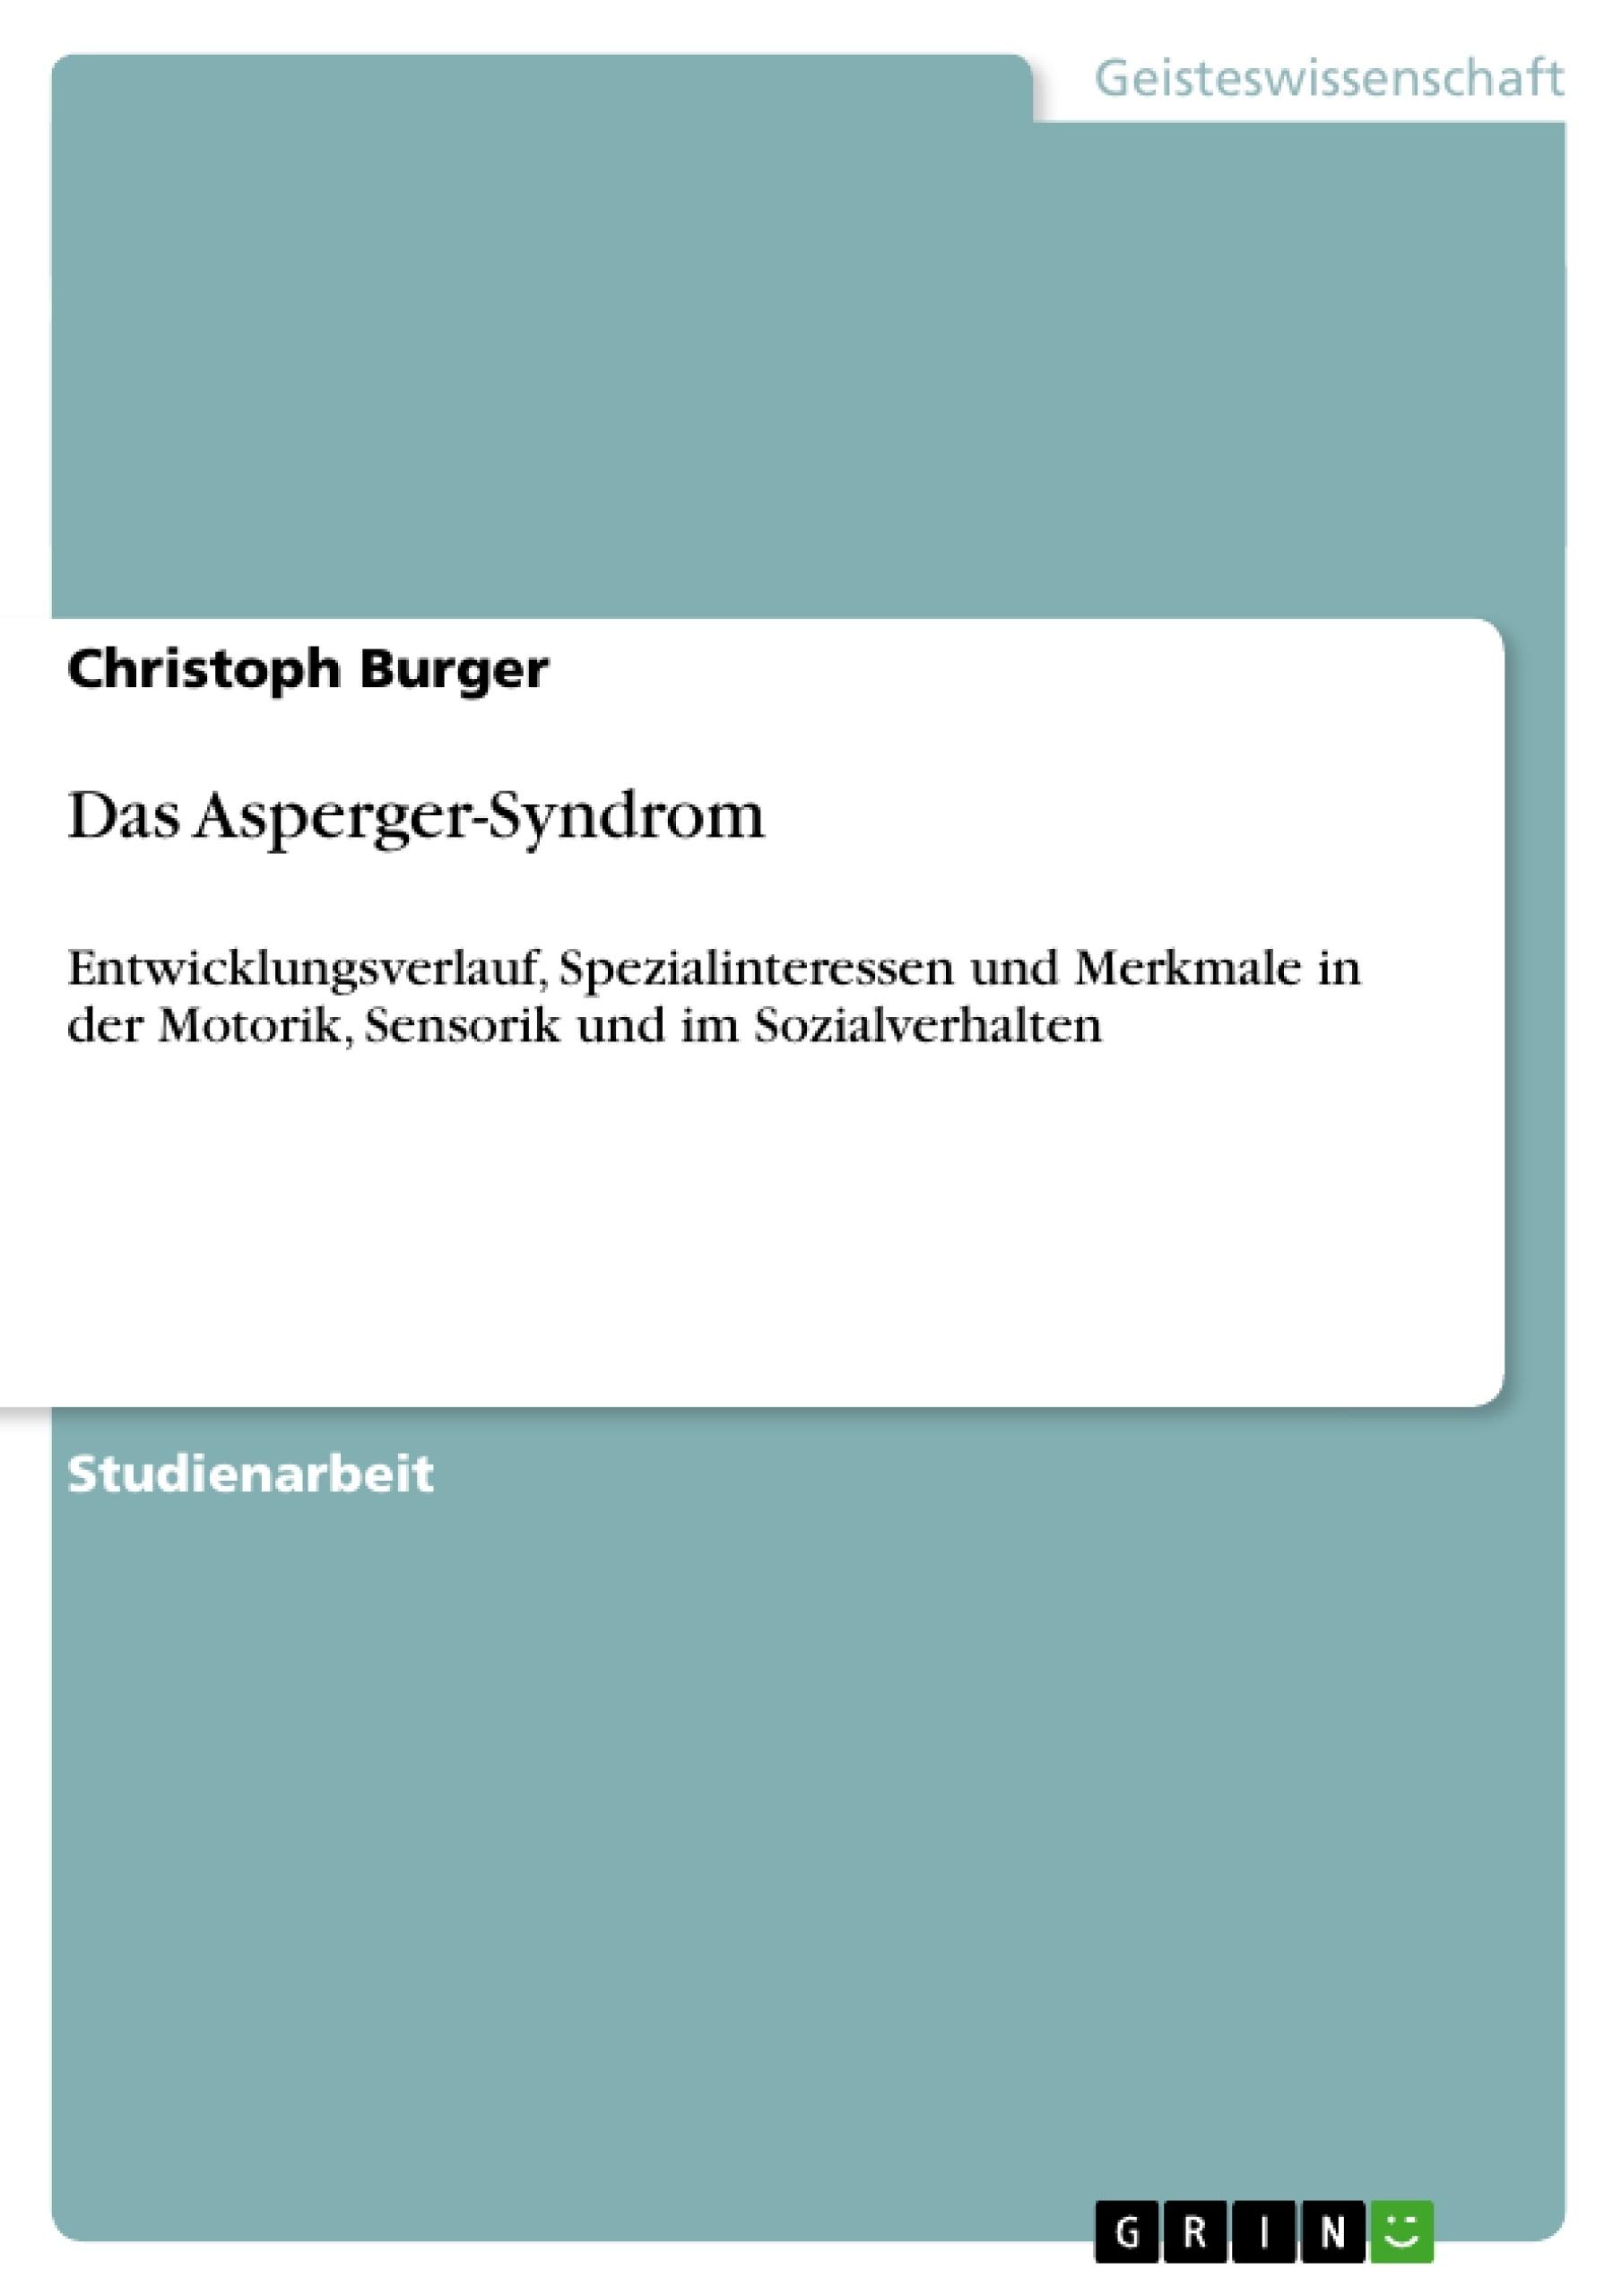 Titel: Das Asperger-Syndrom